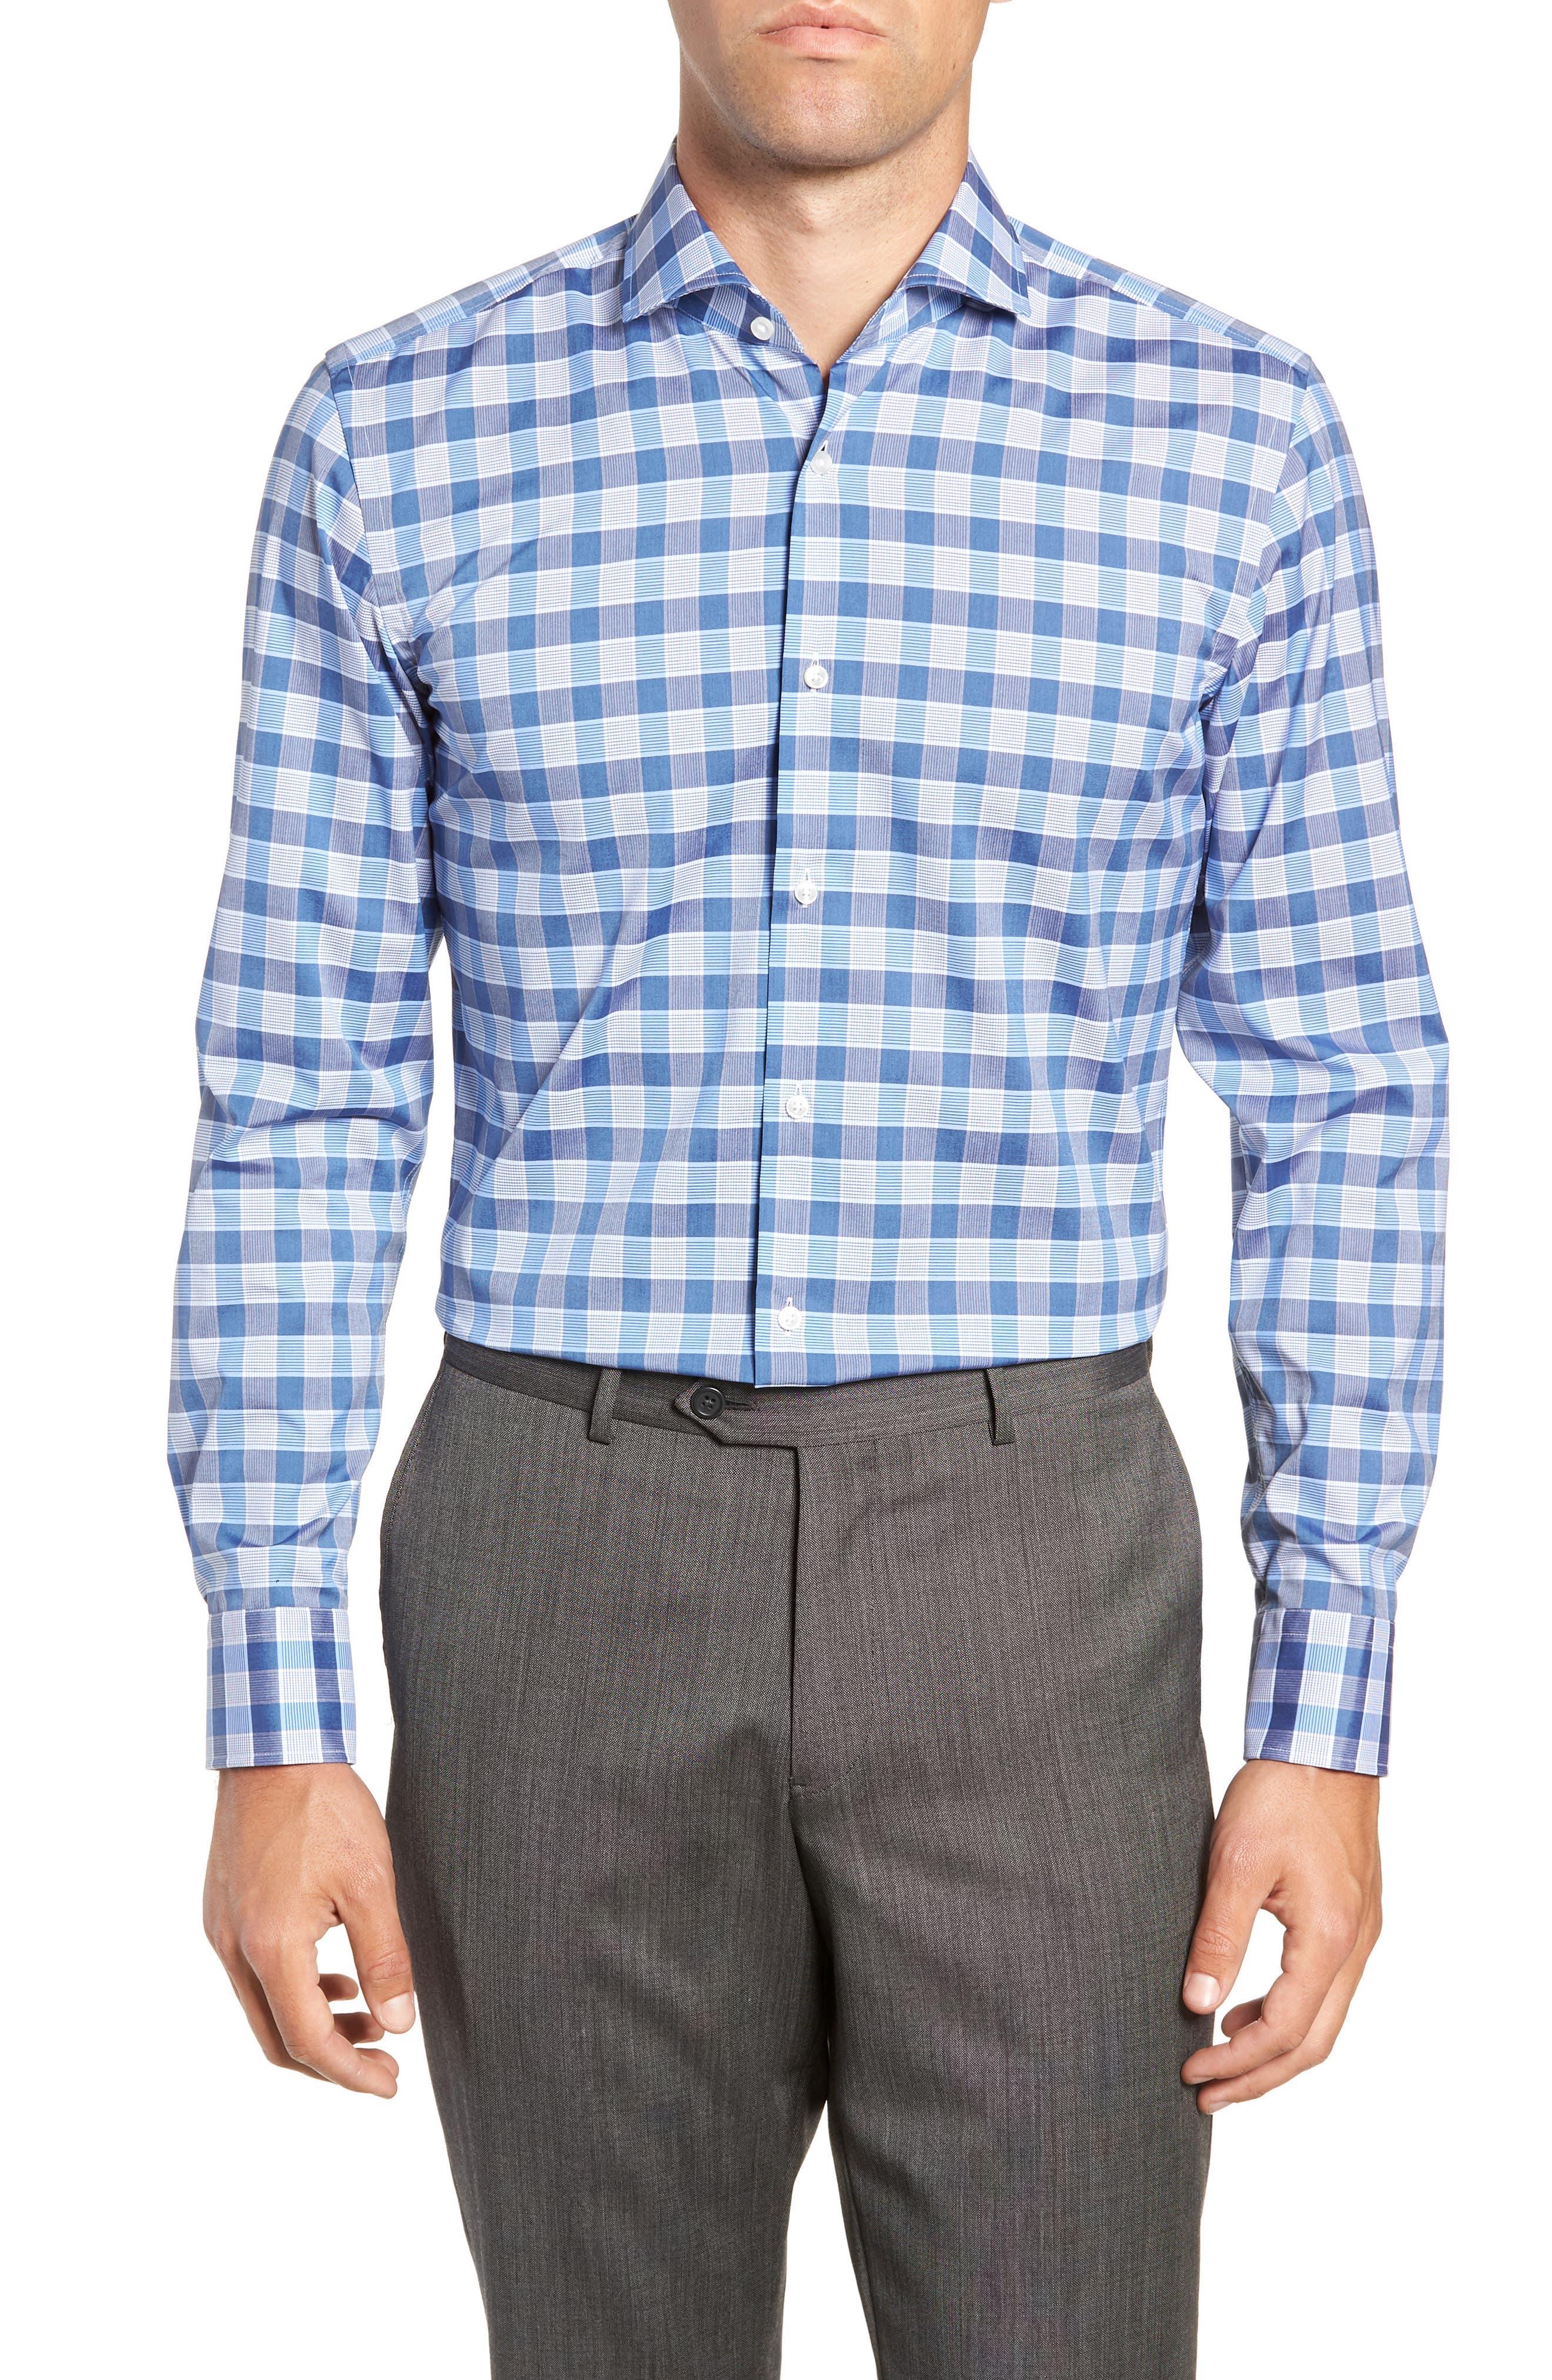 Jason Slim Fit Plaid Dress Shirt,                             Main thumbnail 1, color,                             BLUE